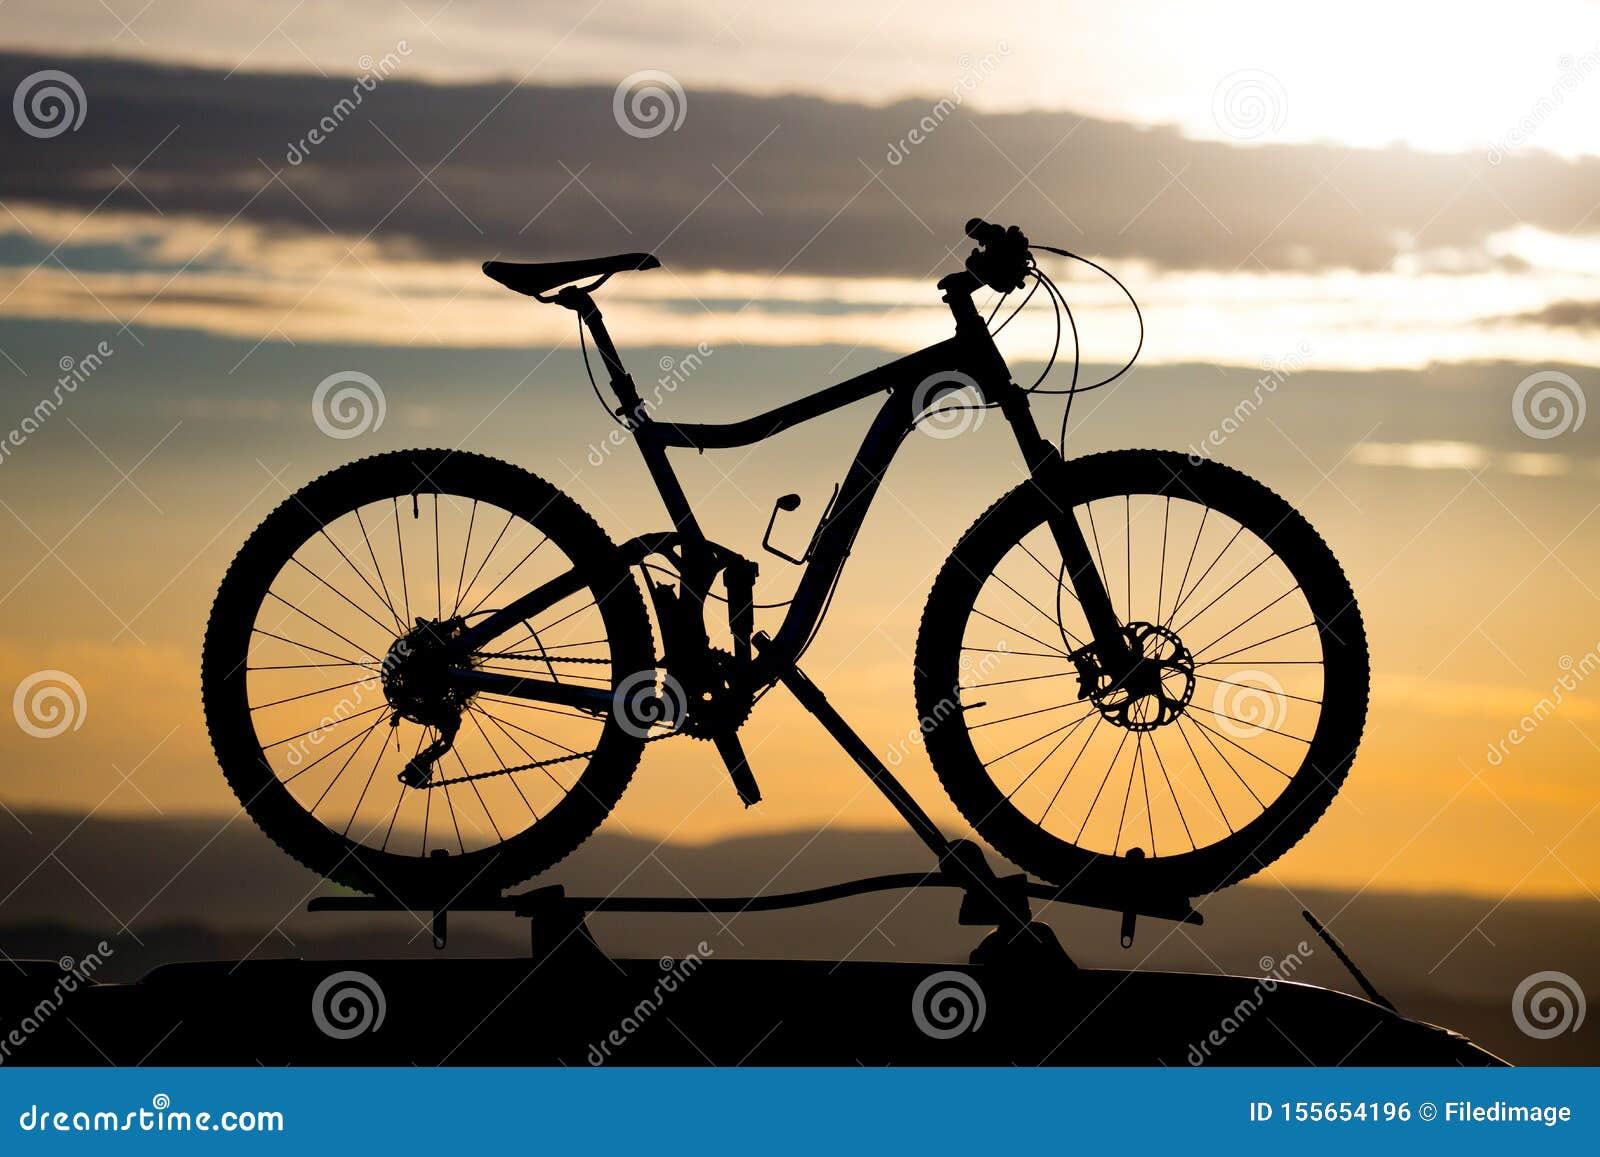 Bike on Roof Rack